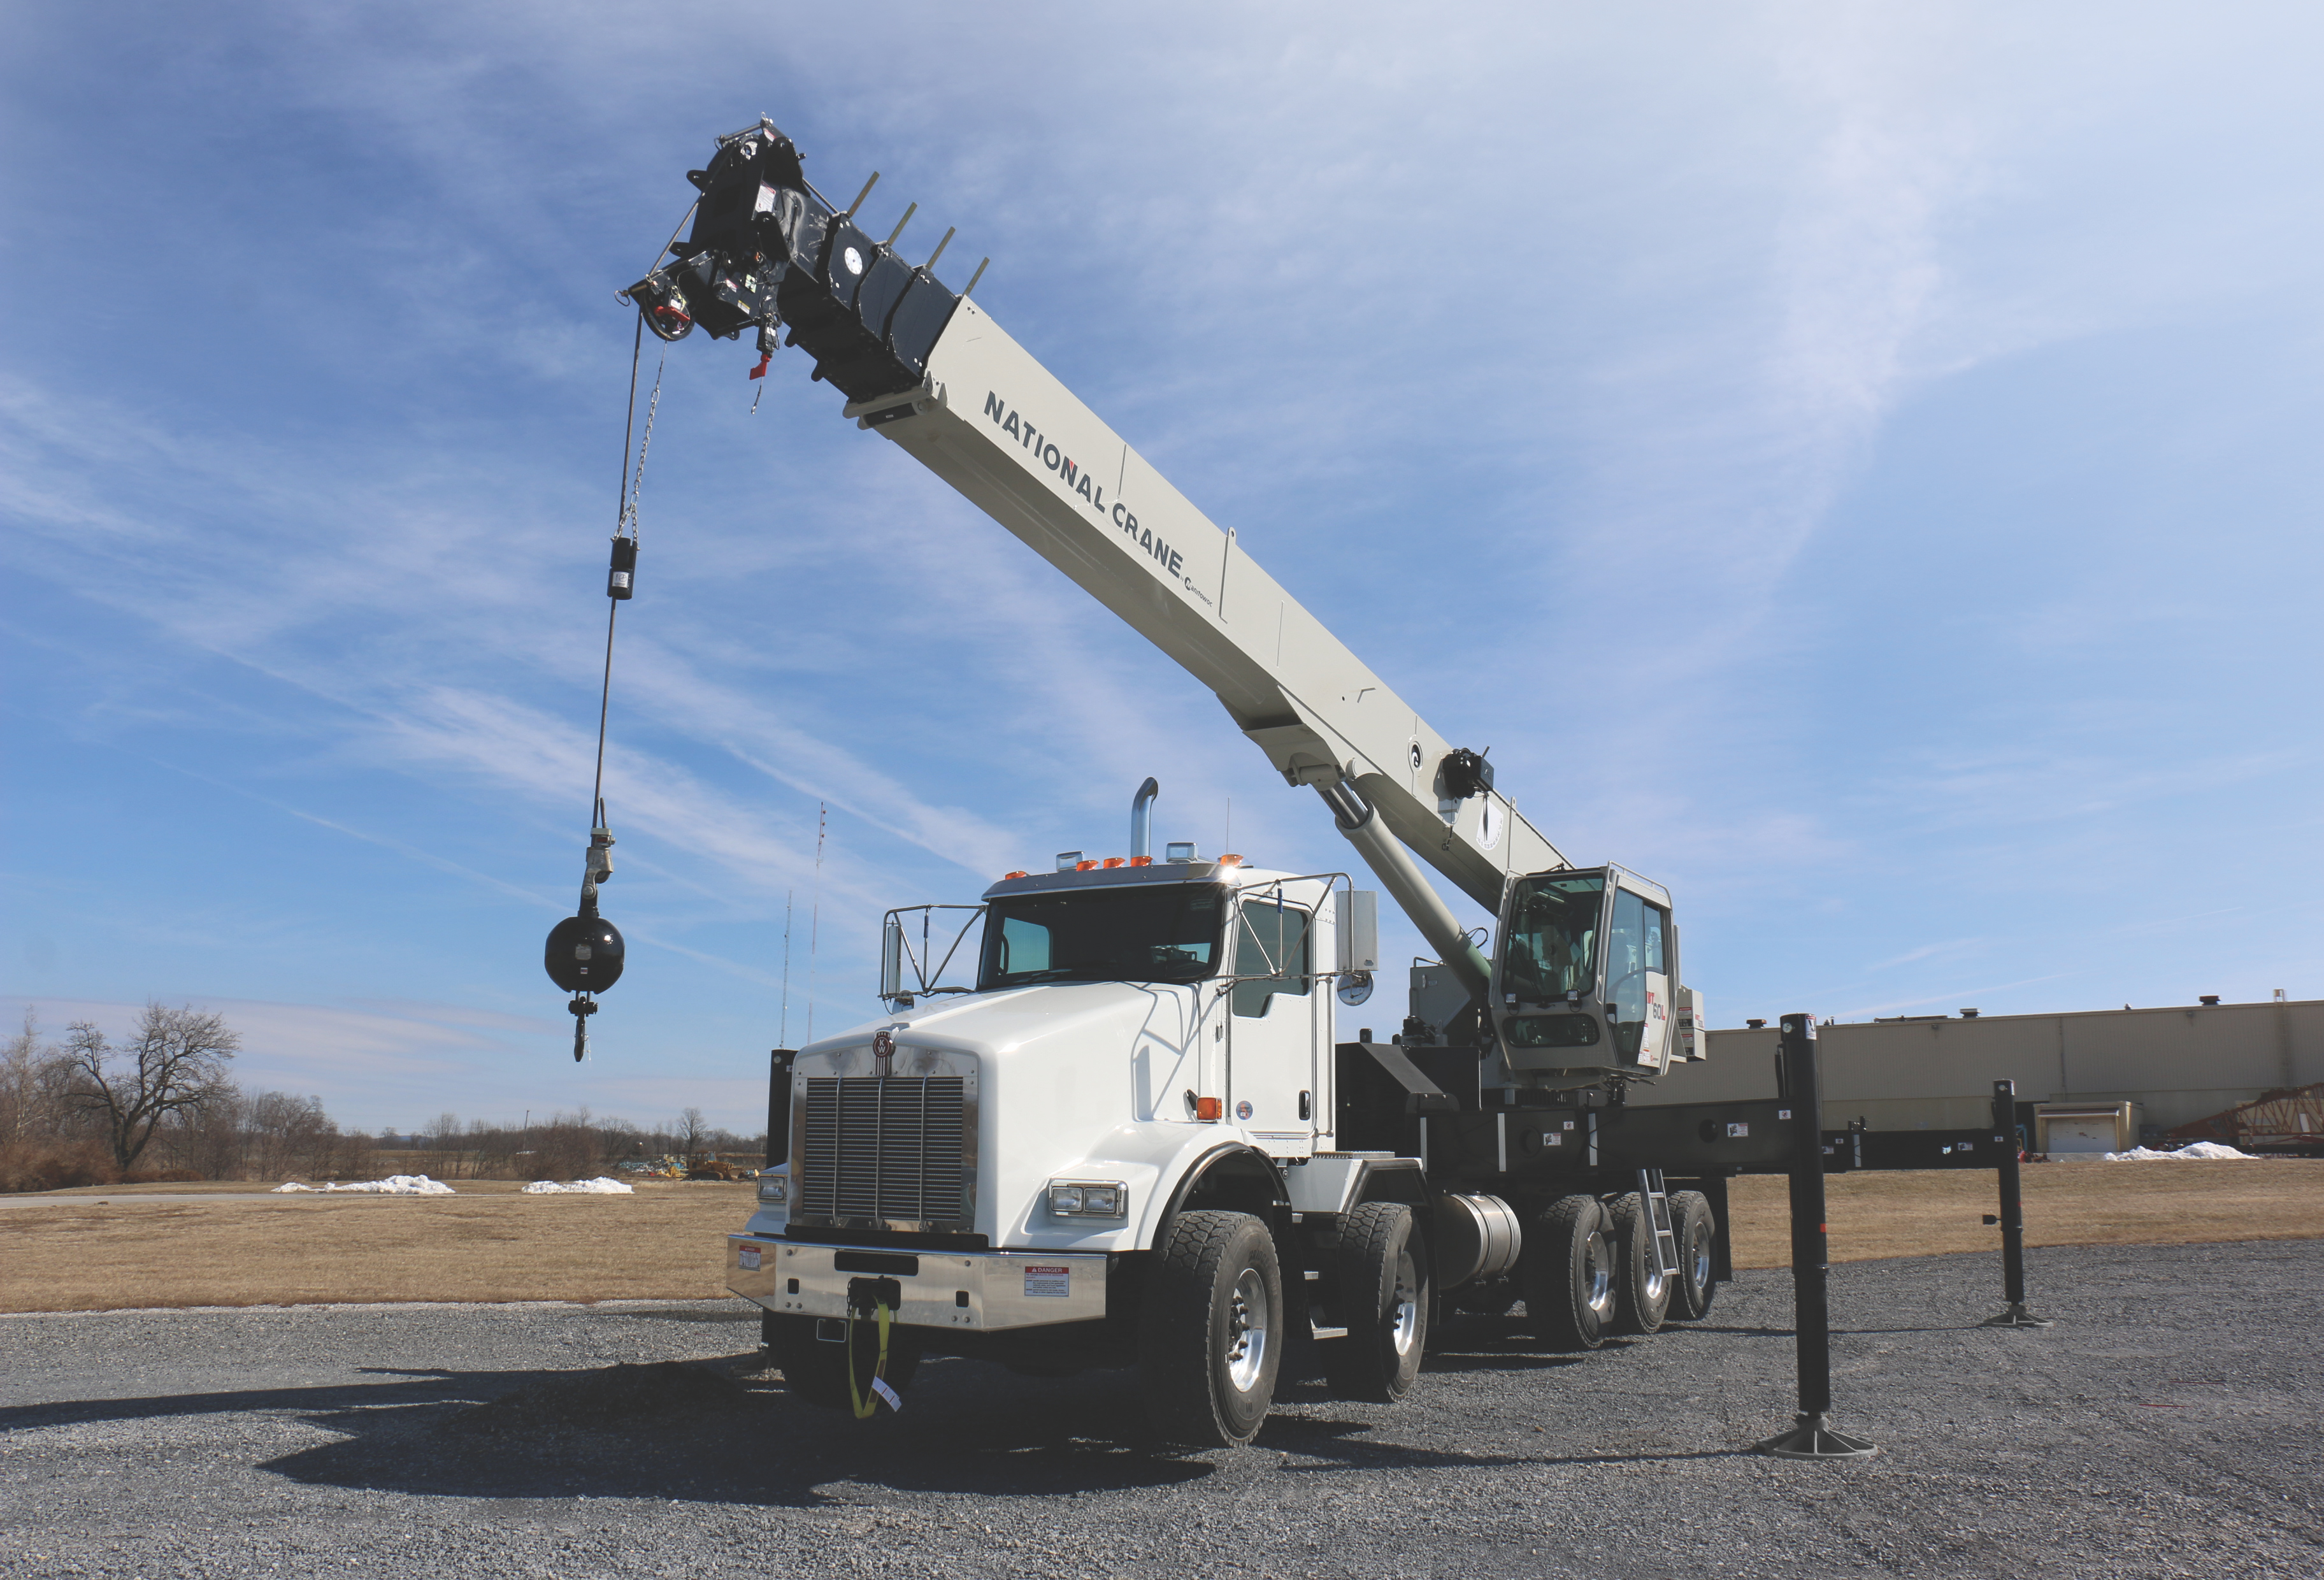 Manitowoc launches new National Crane NBT60L boom truck ⋆ Crane Network News